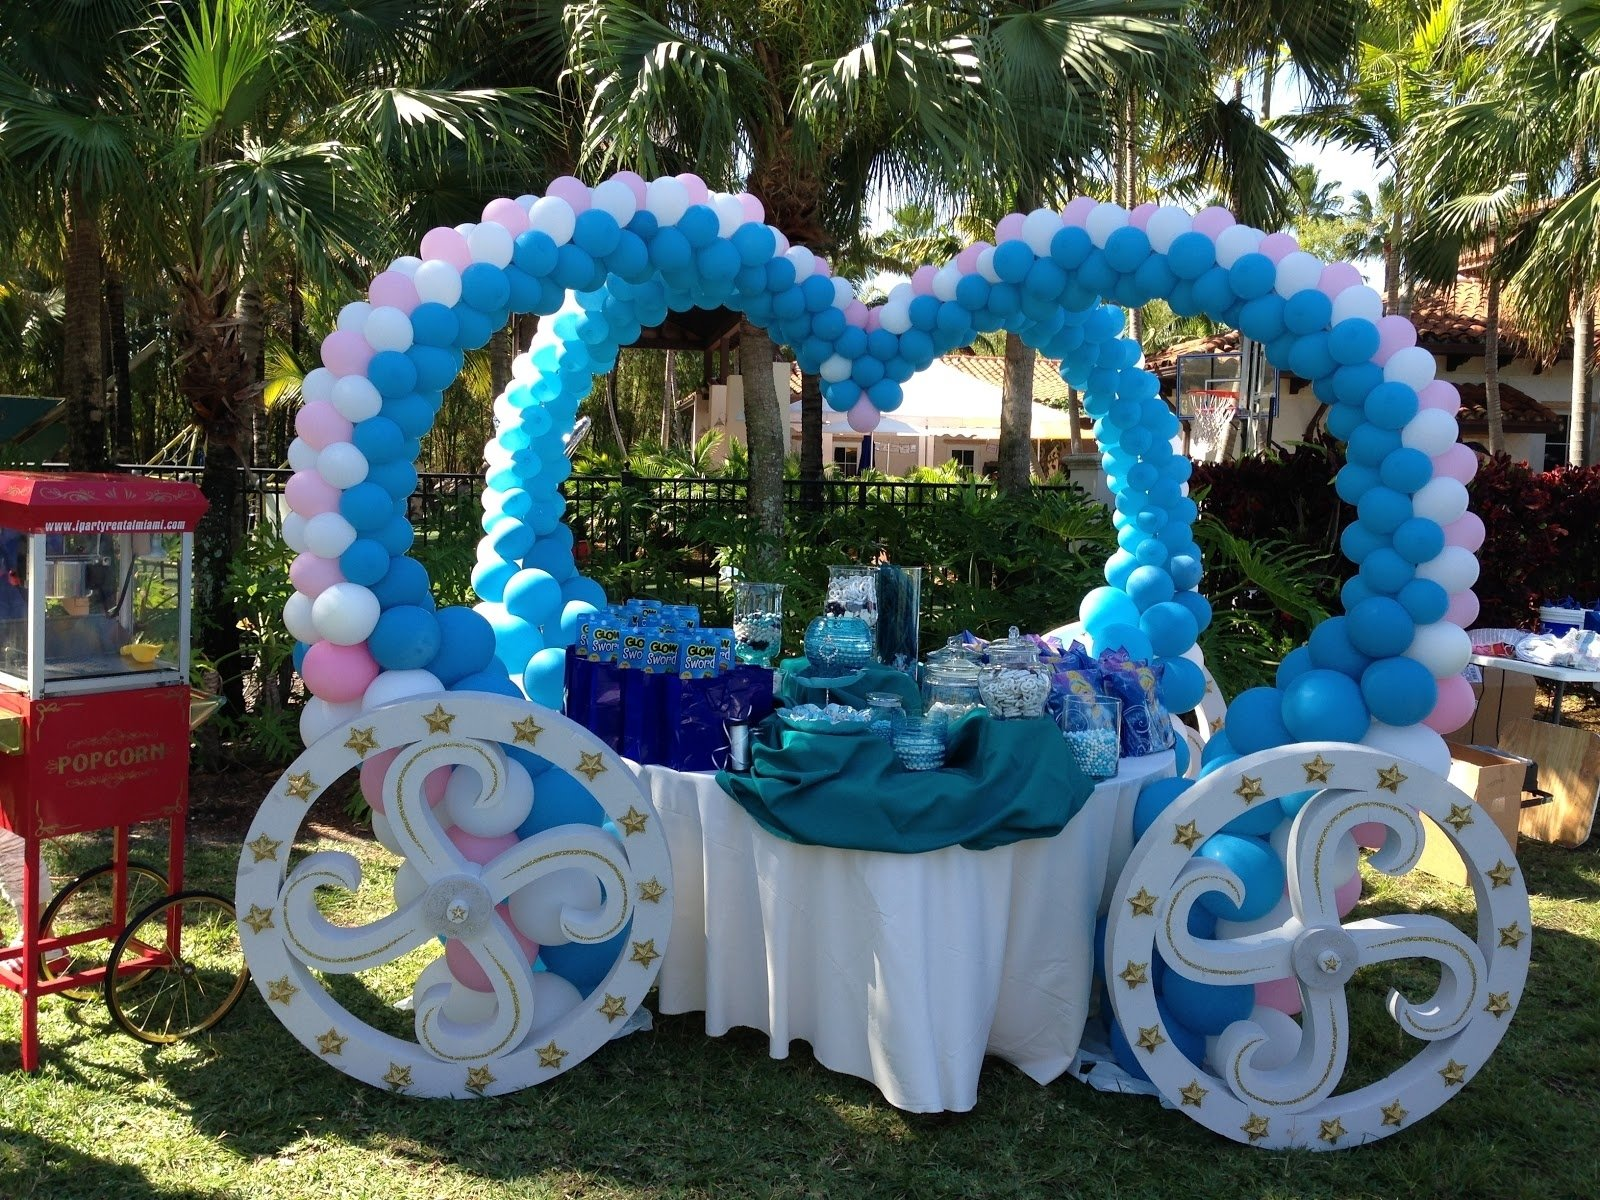 10 Elegant Princess And Prince Party Ideas princepartytheme dreamark events blog princess theme 5th 2020